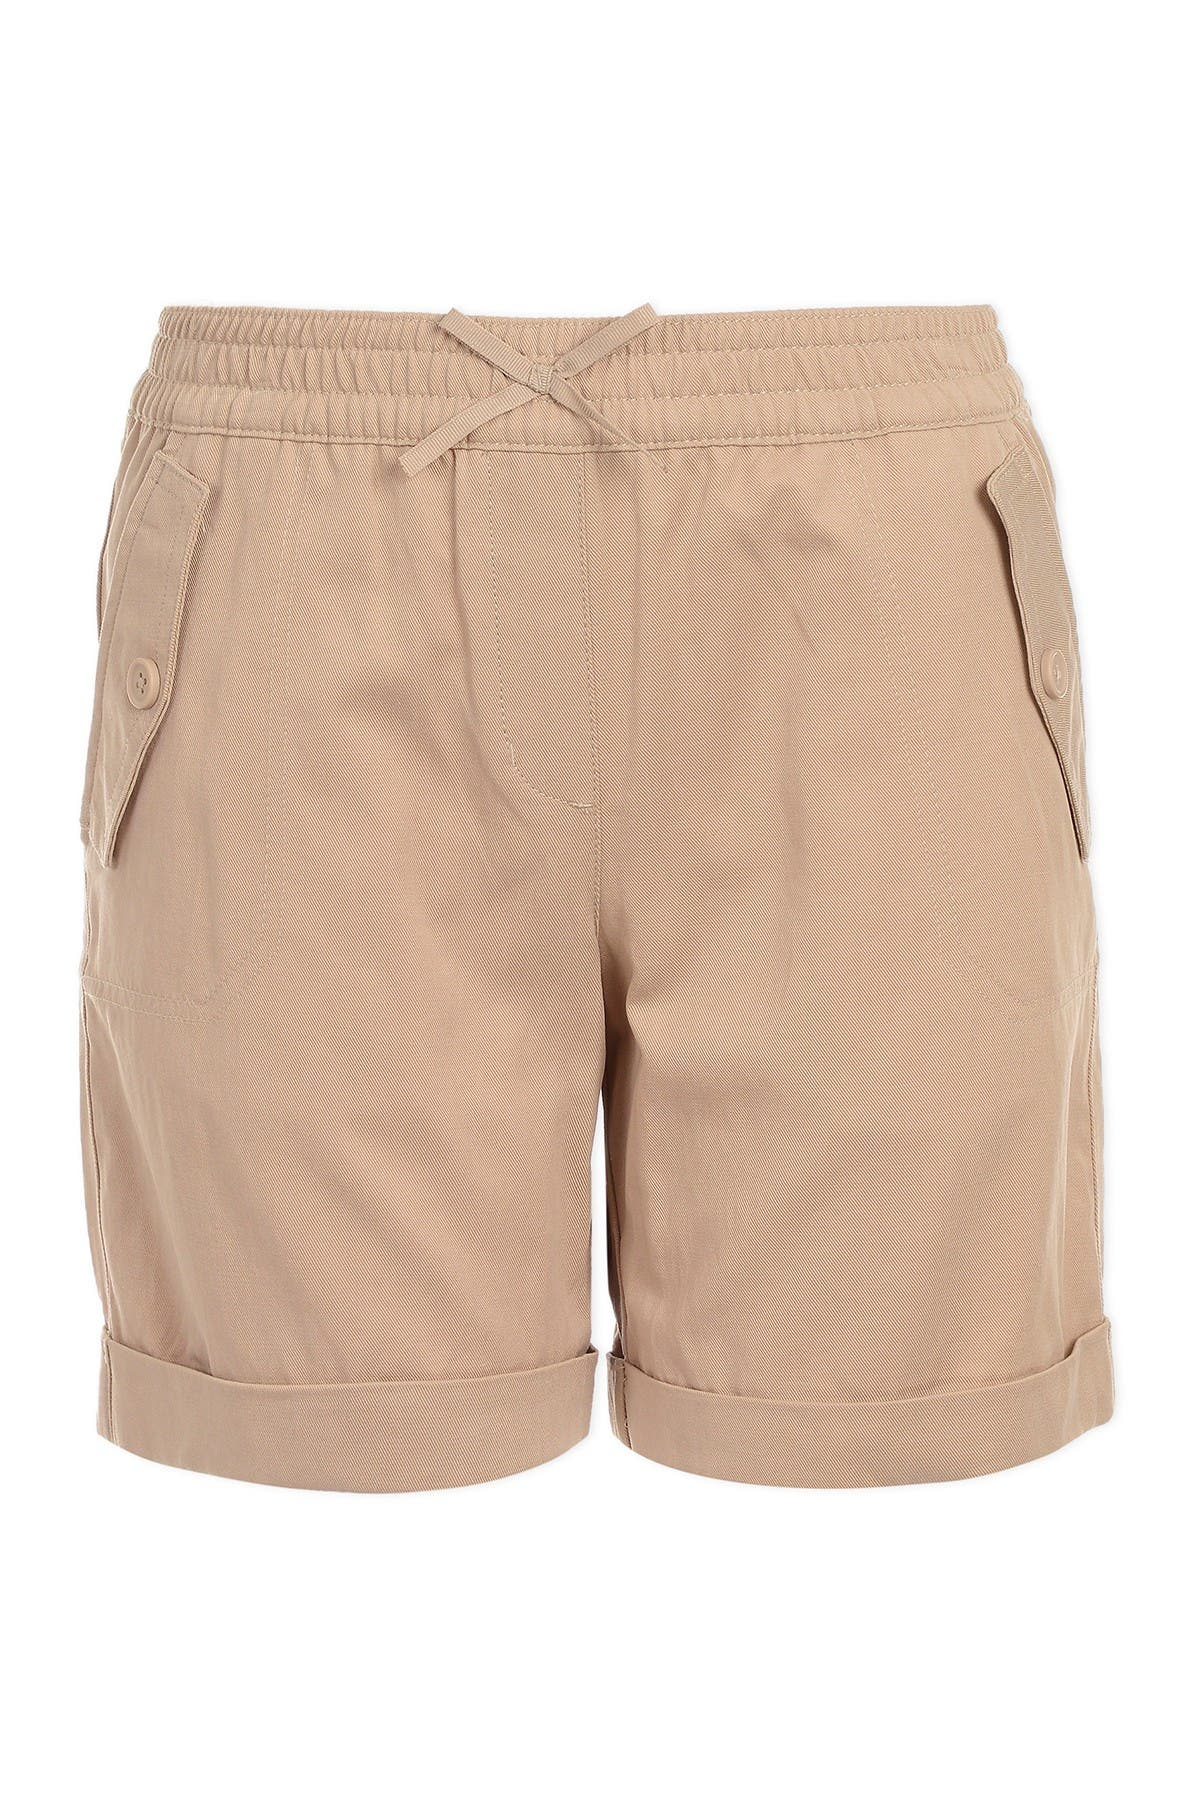 Image of Nautica Uniform Twill Shorts